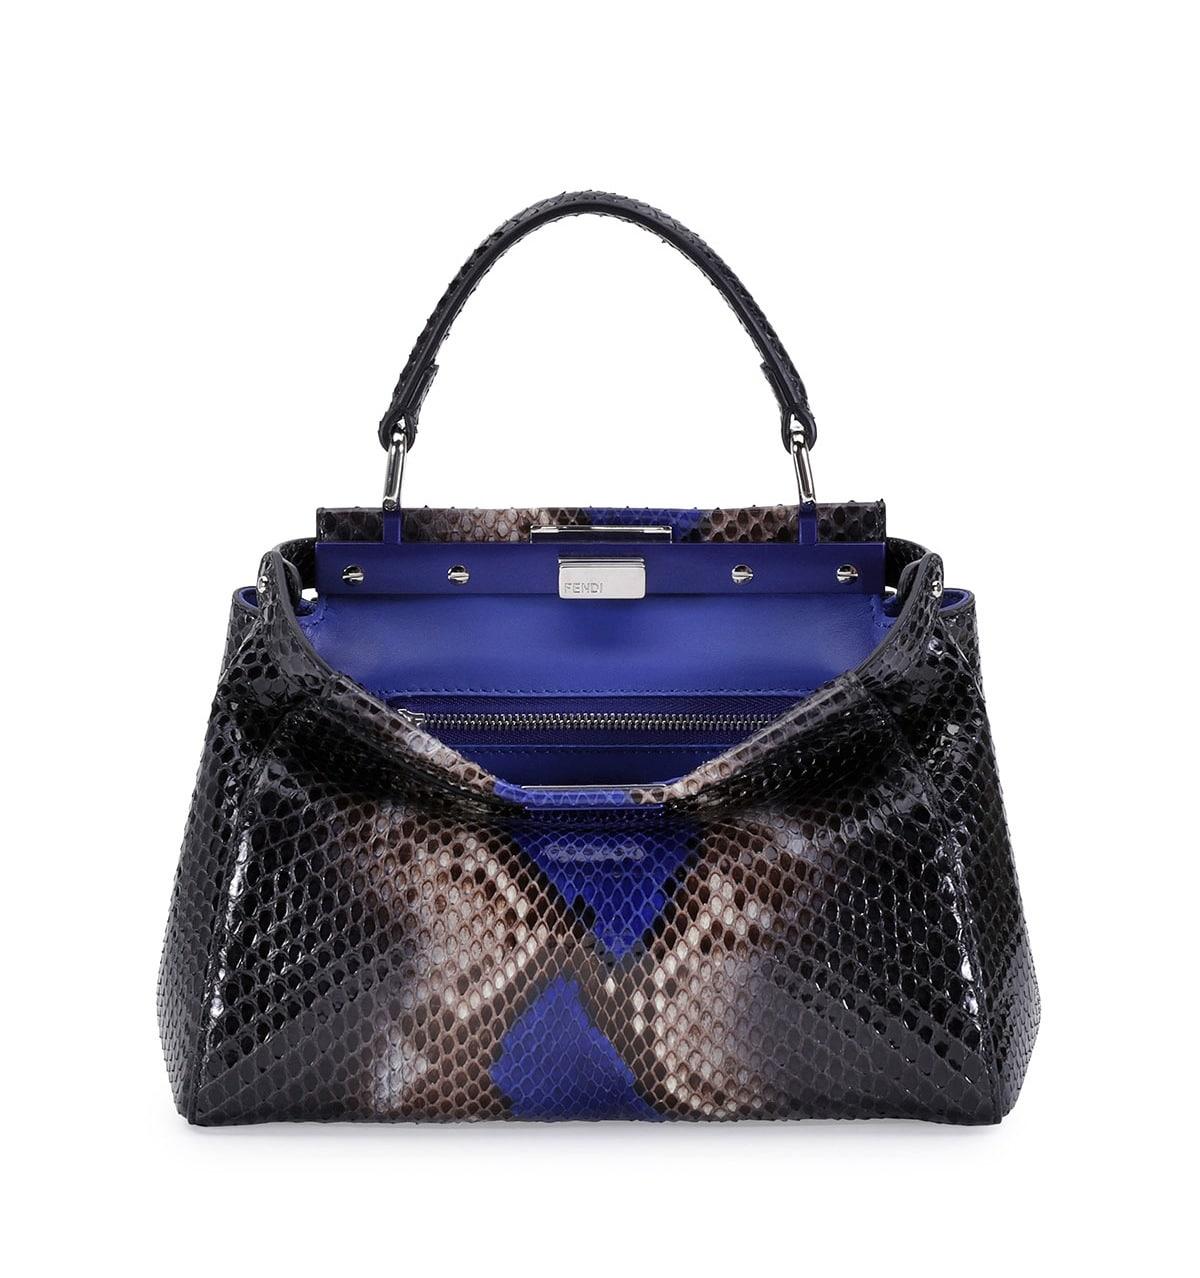 Fendi Handbag New